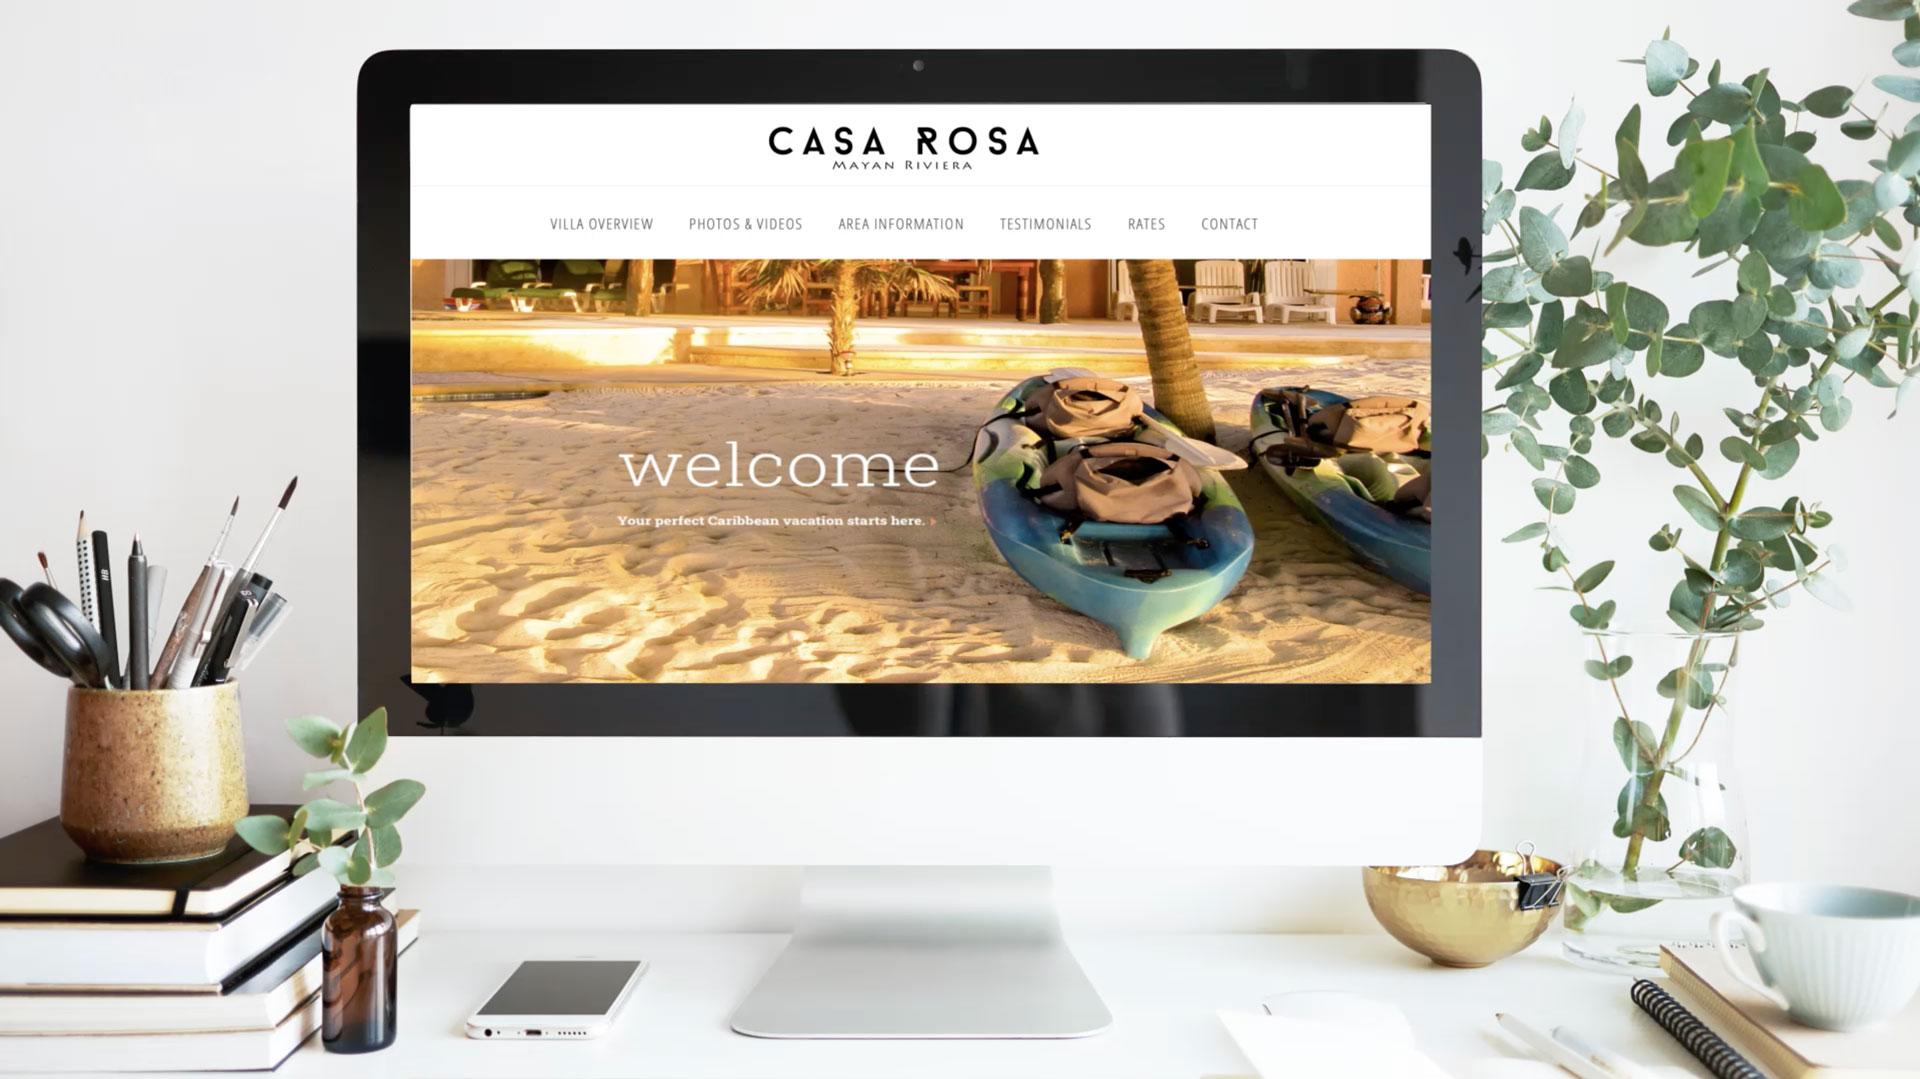 Casa Rosa Mayan Riviera Vacation Rental Website